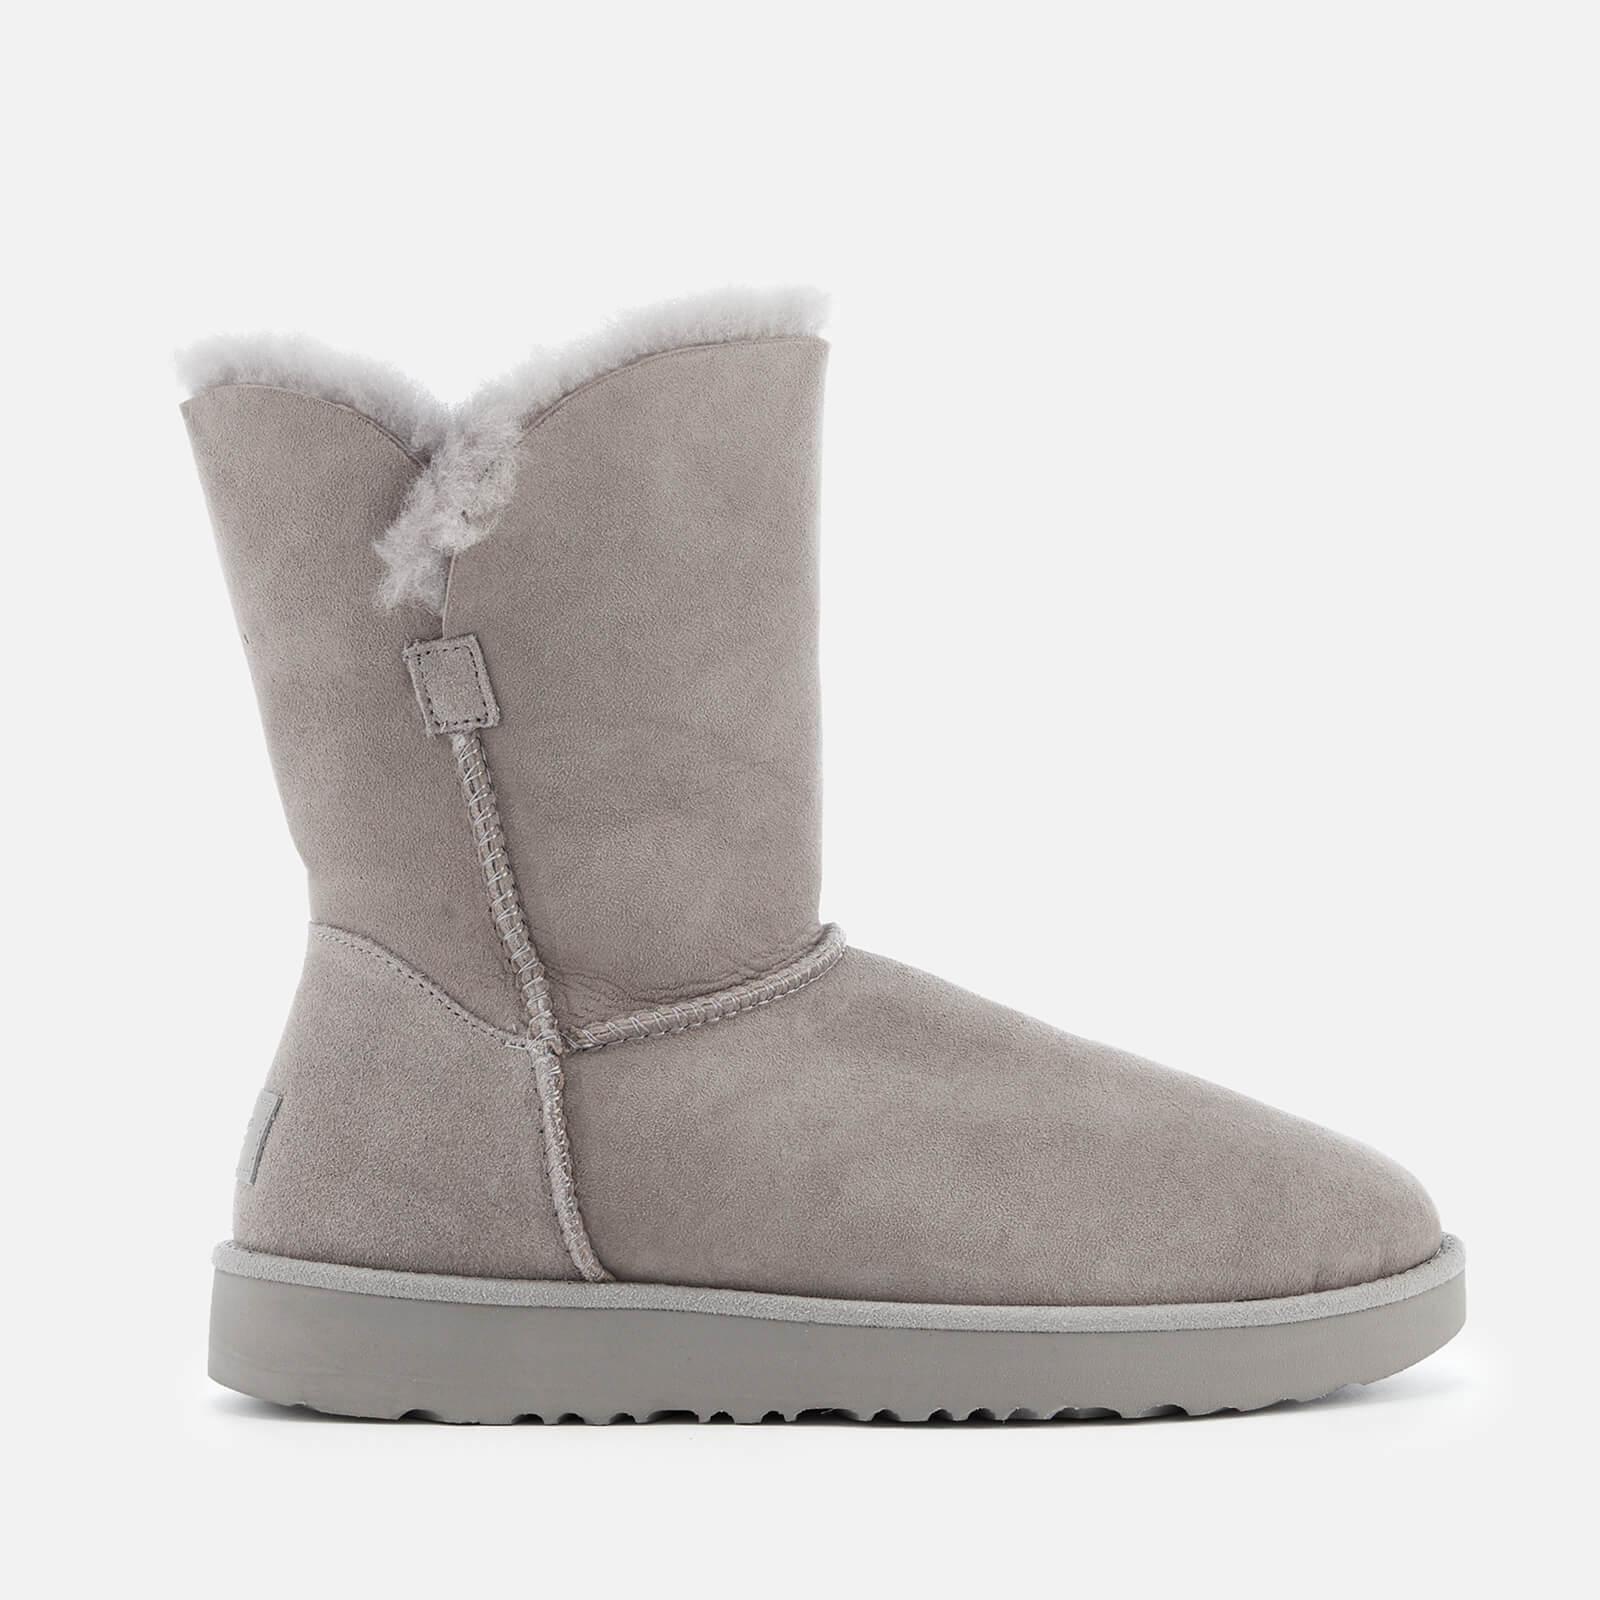 7977dd2067e UGG Women's Classic Cuff Short Sheepskin Boots - Seal